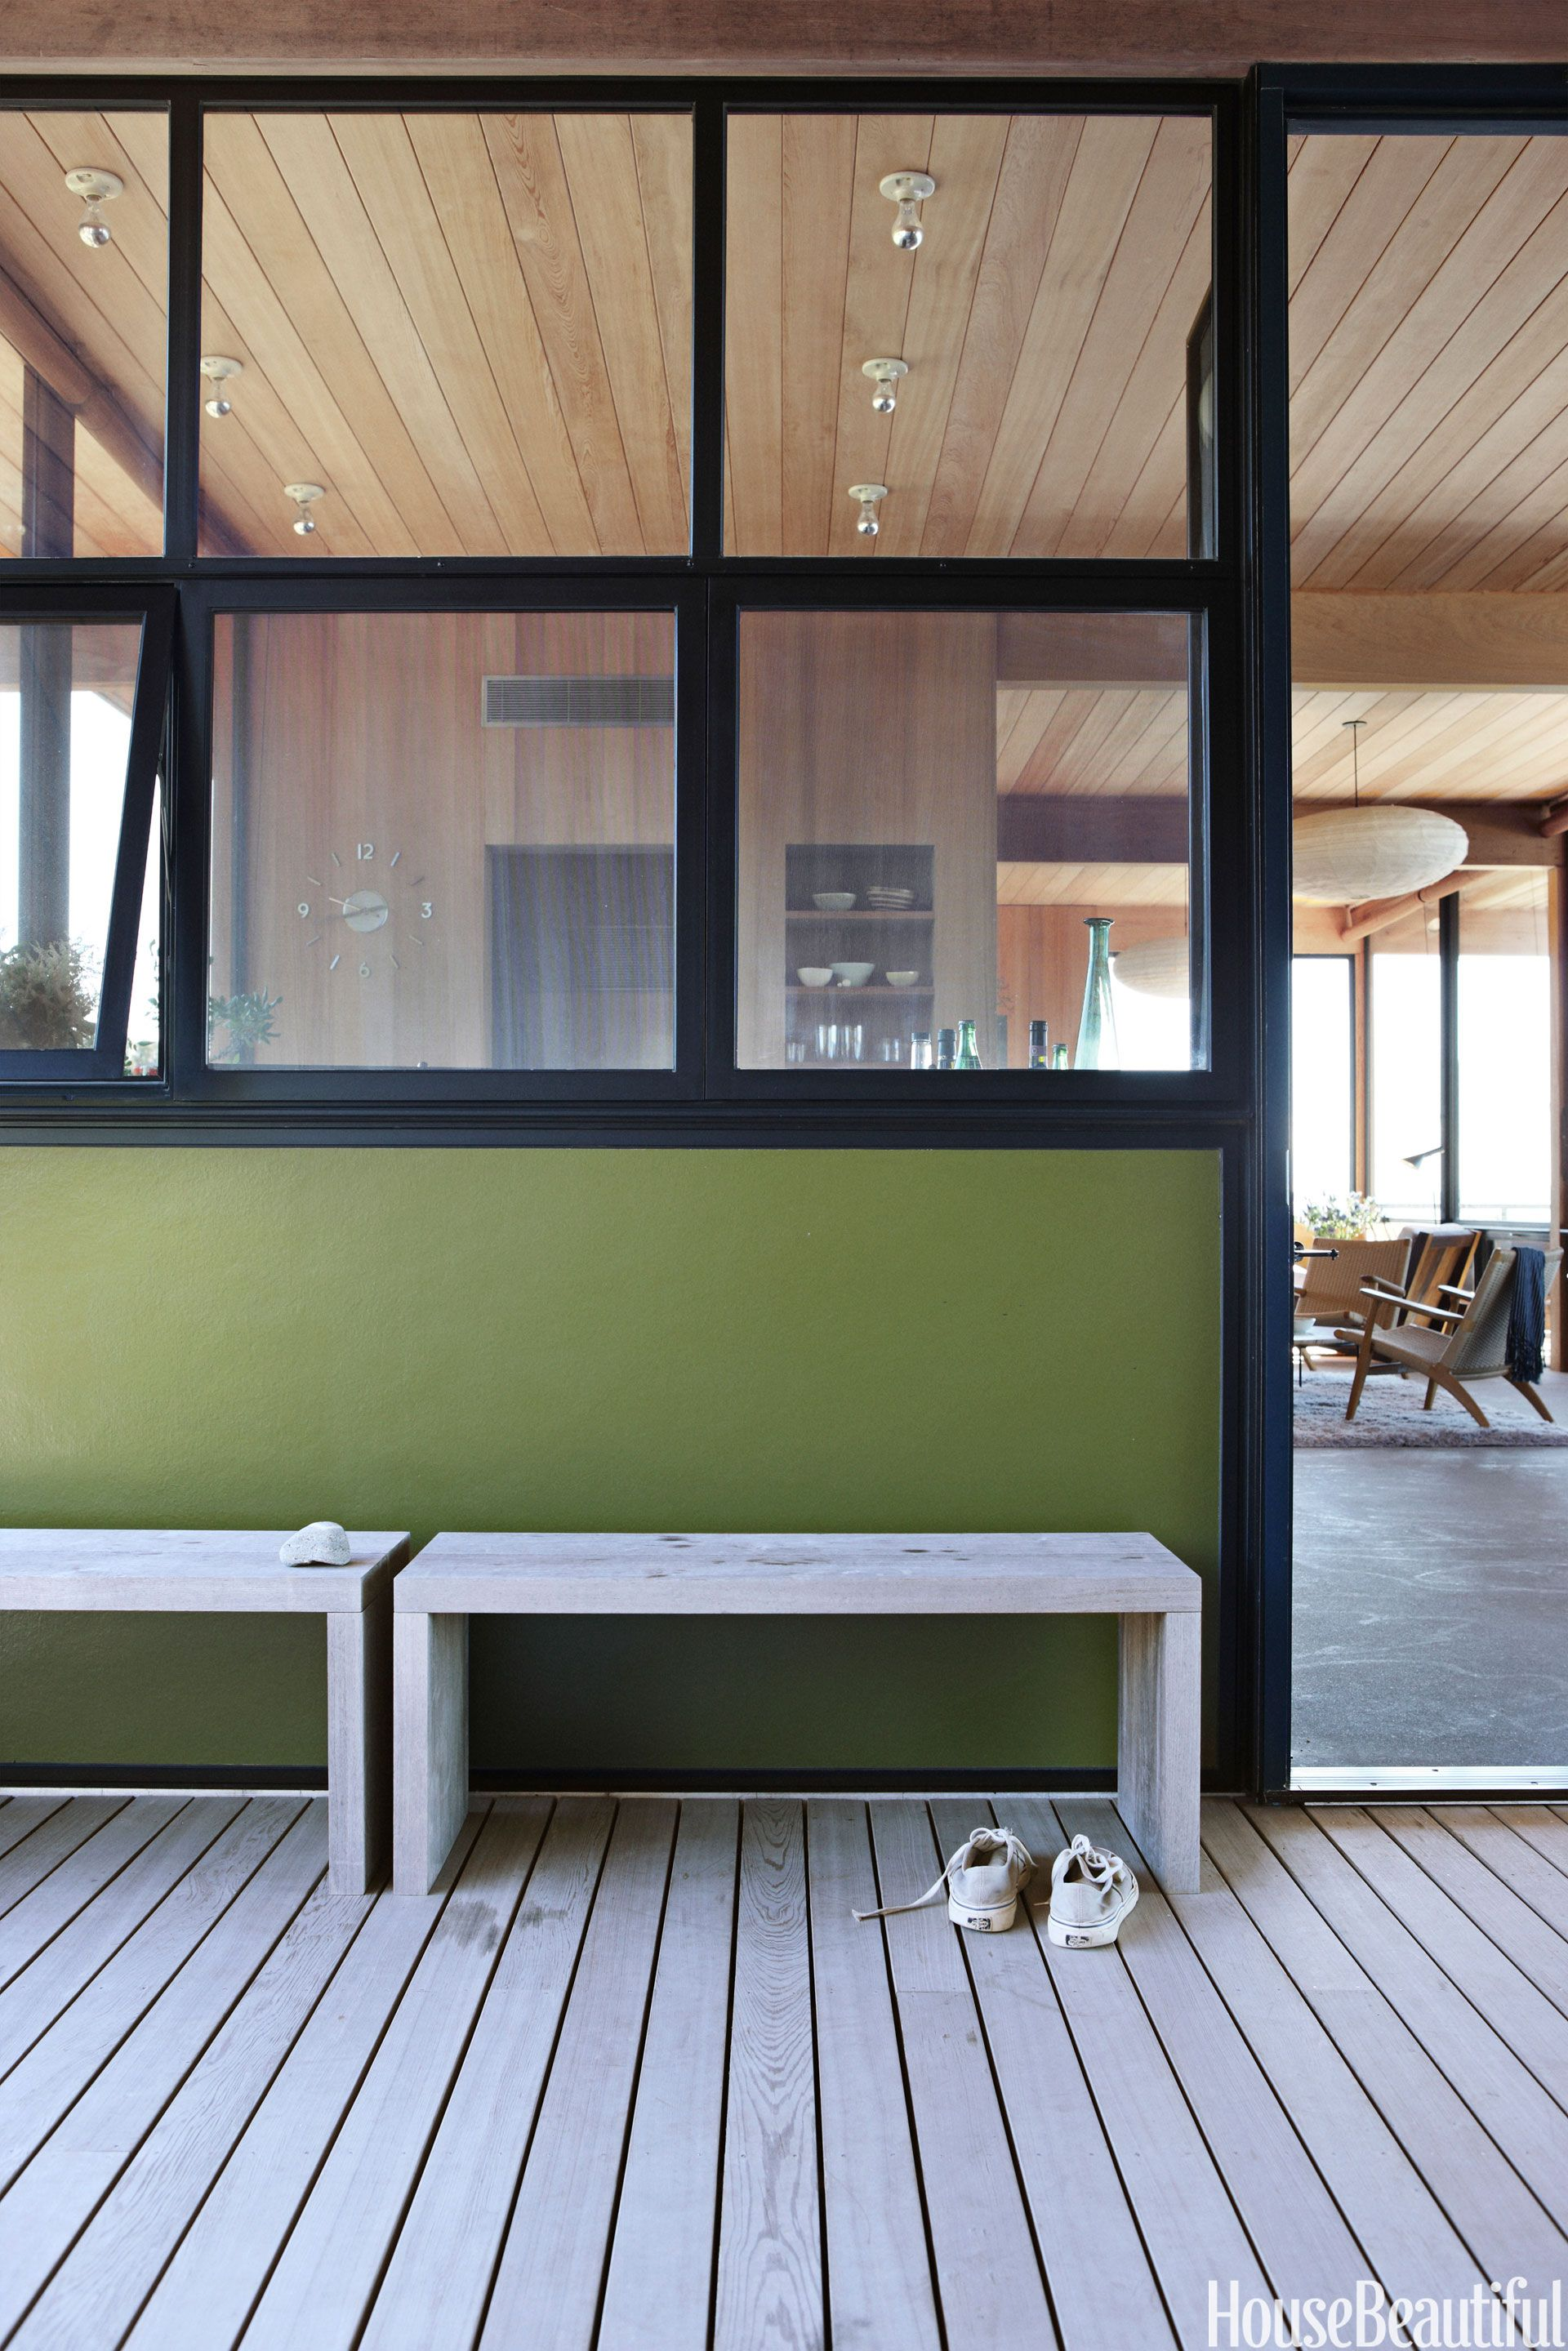 Minimalist Decor Enchanting Minimalist Decor Style  Minimalist Rooms Design Ideas